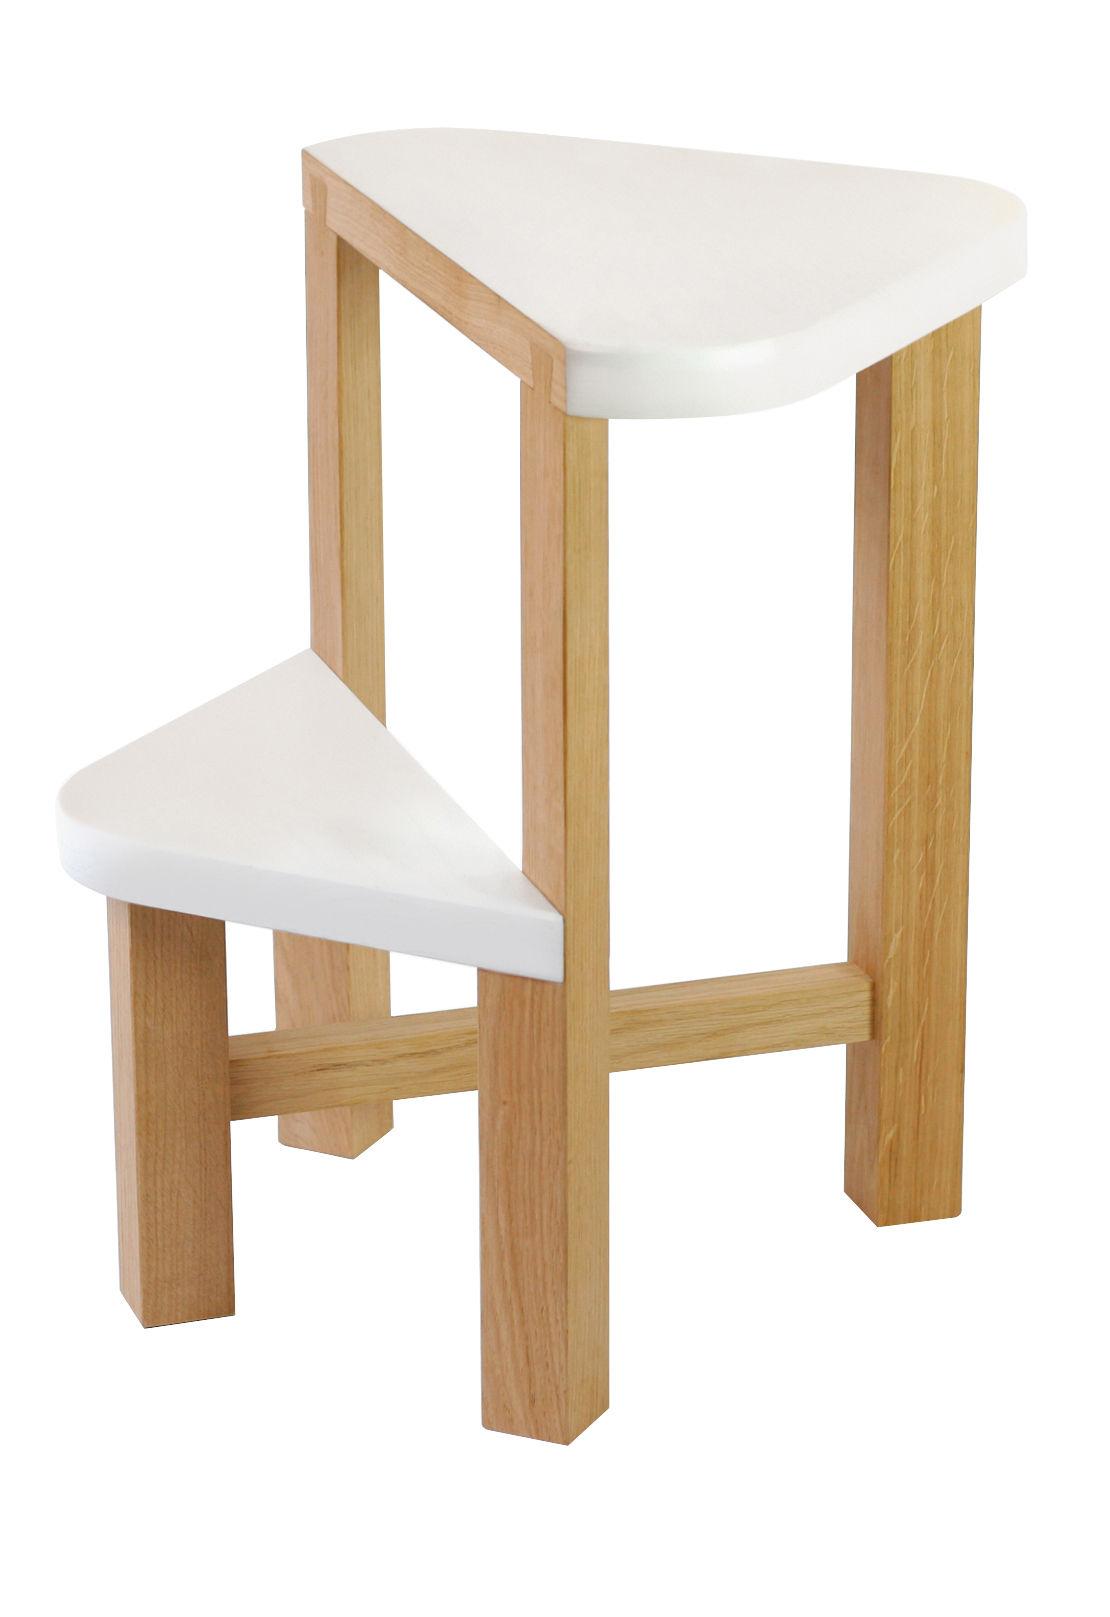 Escabeau Design Good Tagres U Escabeau With Escabeau Design  # Schema Table De Jardin En Bois